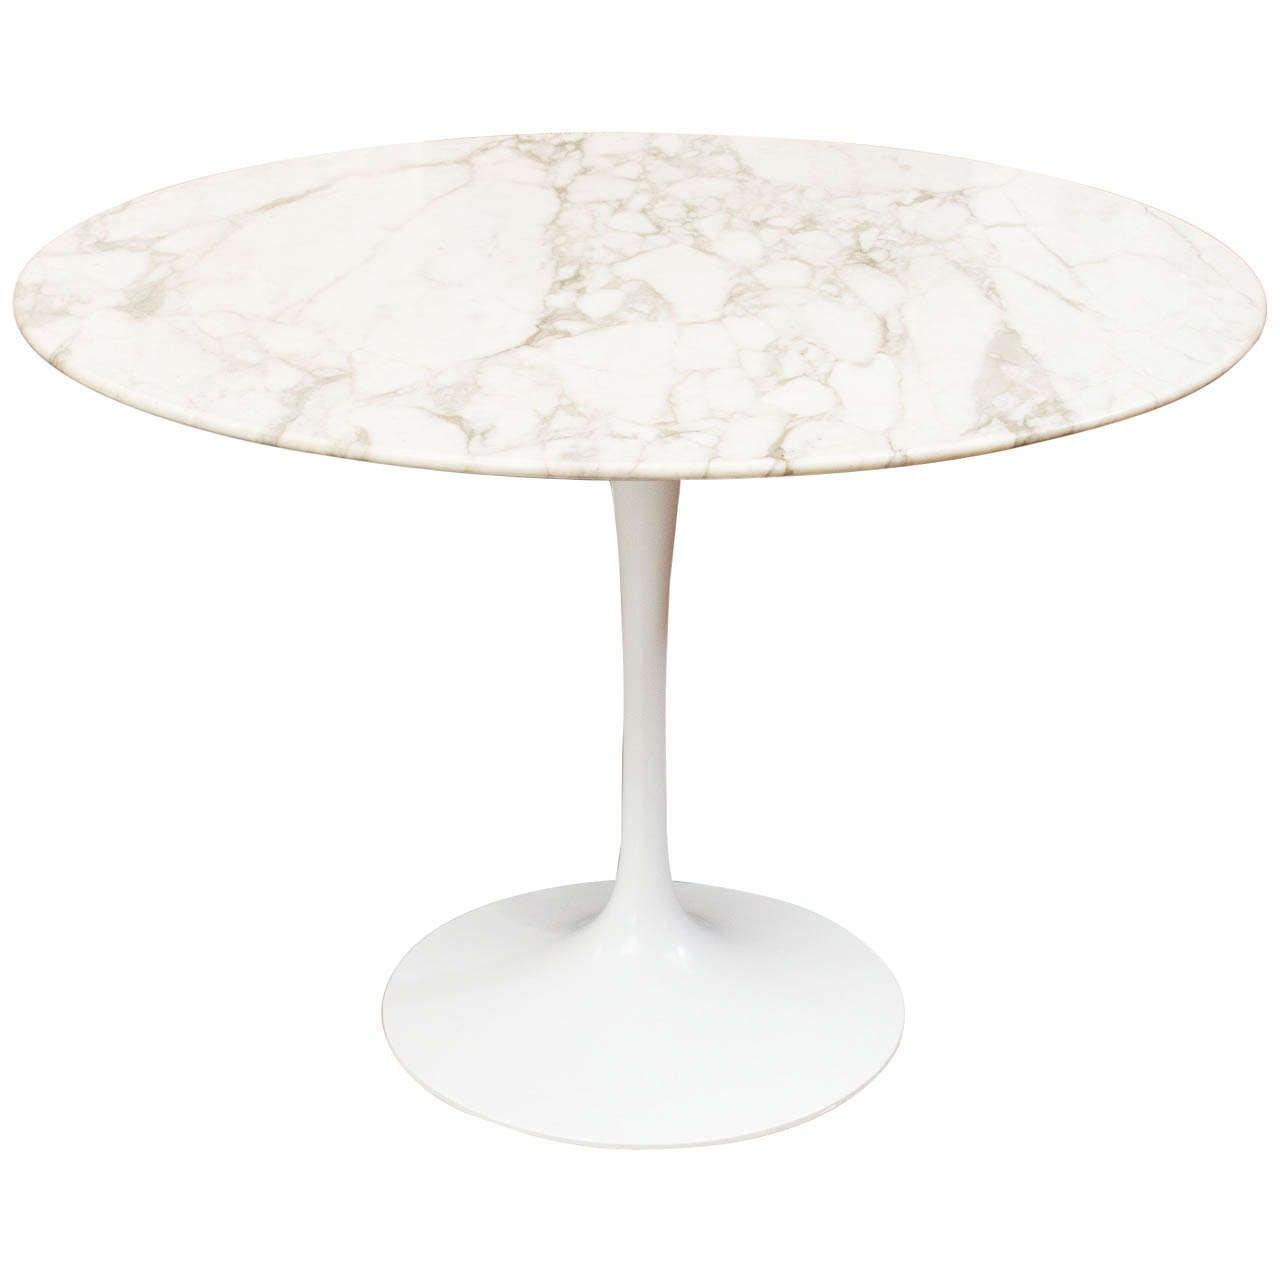 knoll marble tulip table at 1stdibs. Black Bedroom Furniture Sets. Home Design Ideas